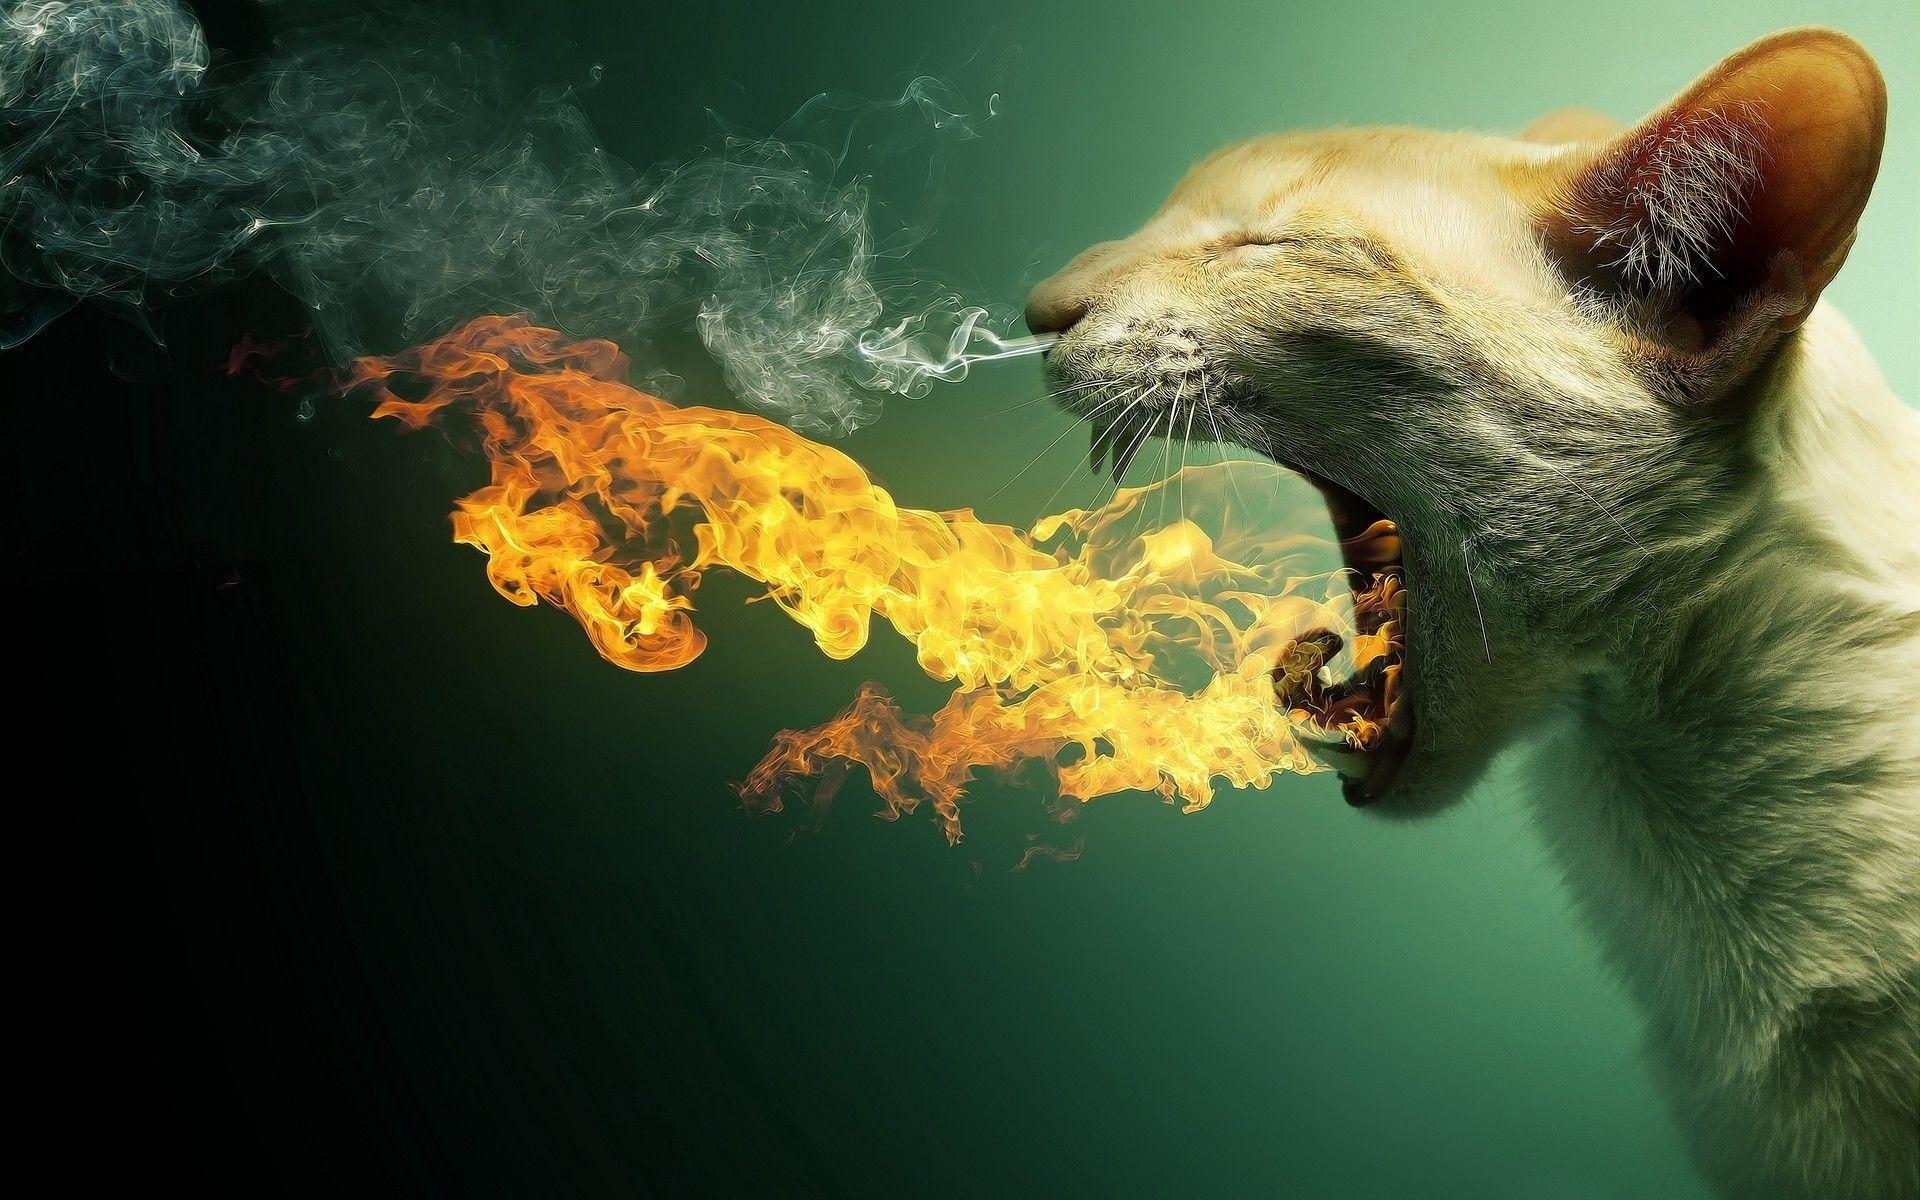 fire breathing cat cool